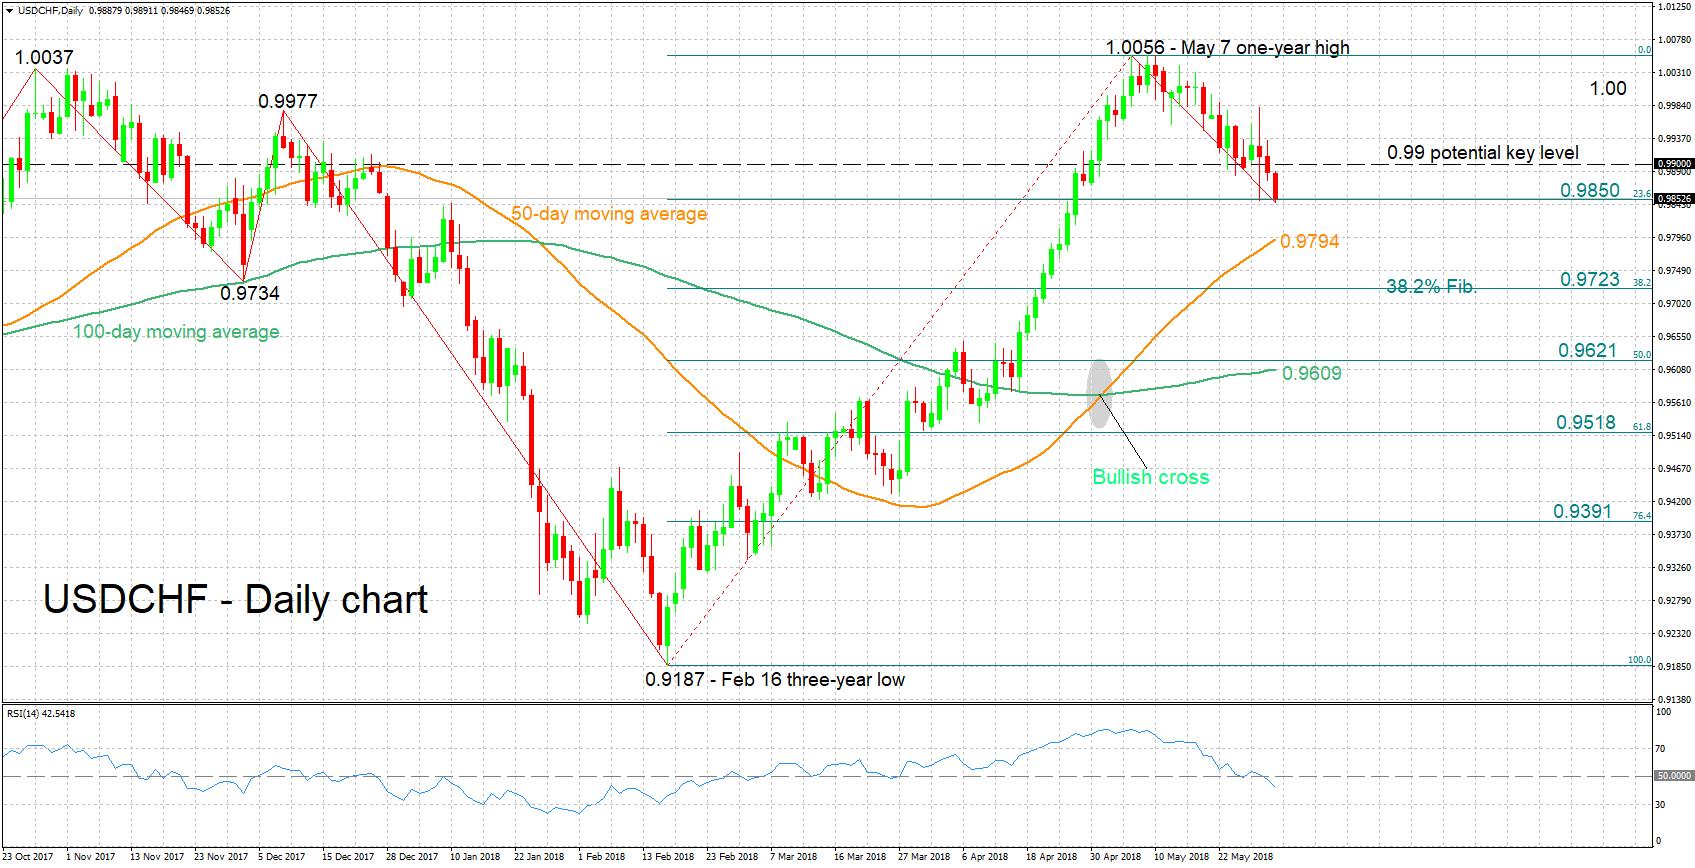 USD/CHF 31/05/18 | EconAlerts